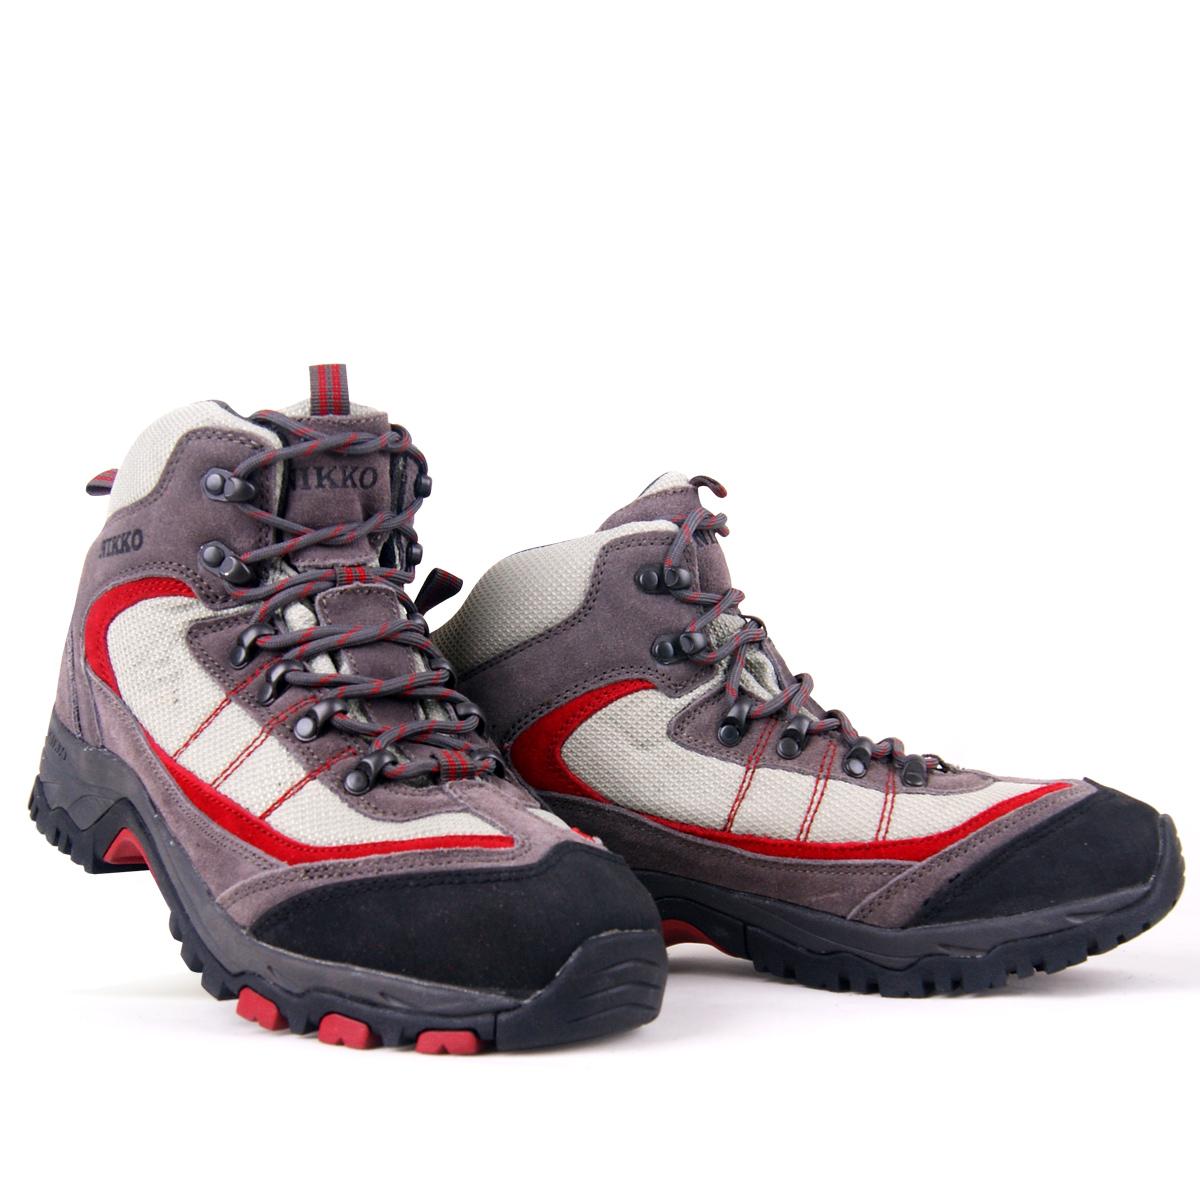 трекинговые кроссовки Nikko sdfaw323 Nikko / hidaka